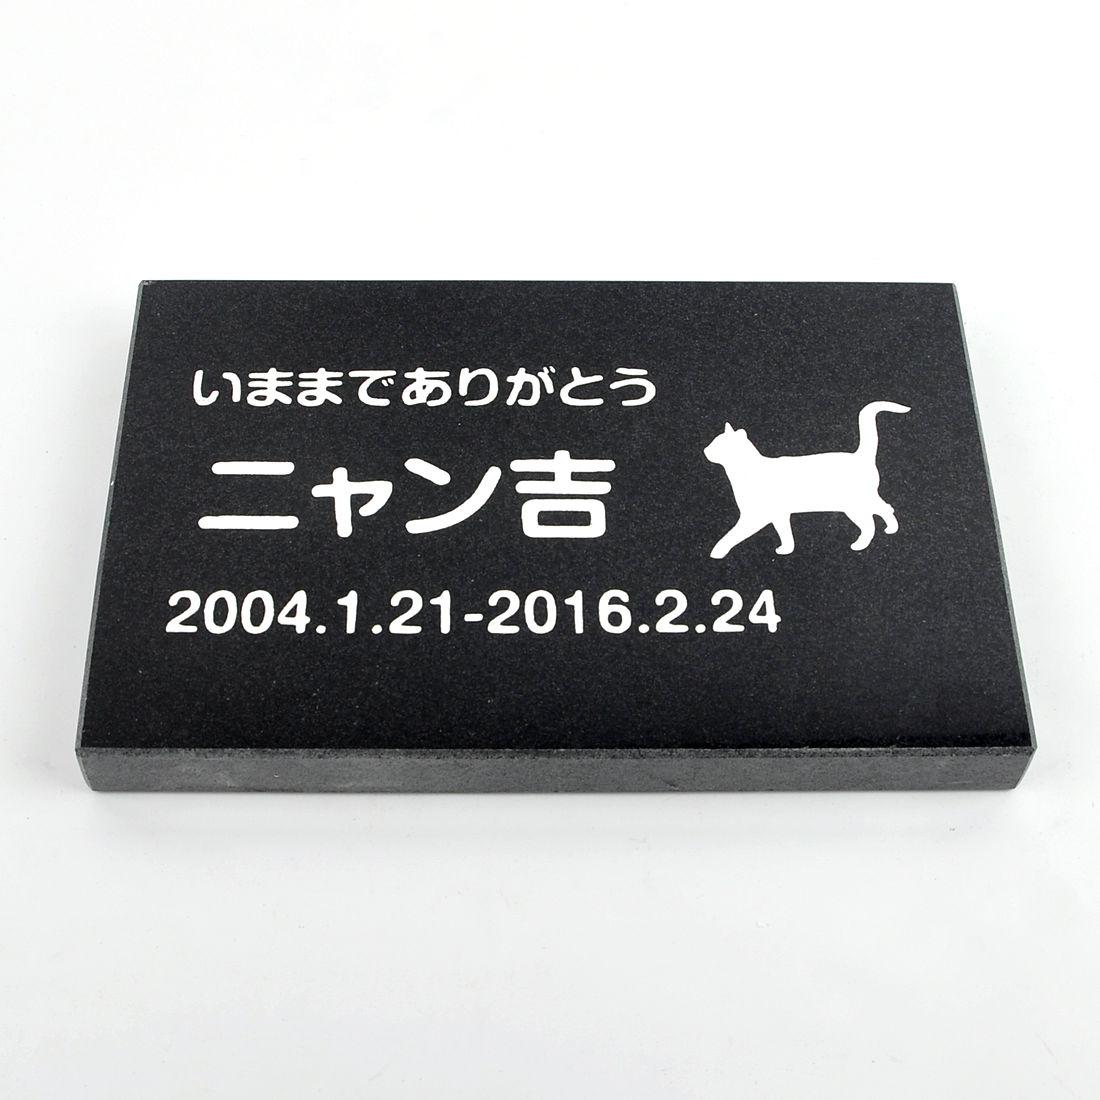 Pet&Love. ペットのお墓 天然石製 シンプル型 御影石 黒  200x130mm(厚さ20mm)  【HLS_DU】【楽ギフ_名入れ】 attr130attr ctgr2ctgr sml3sml+ctgr2ctgr CAT